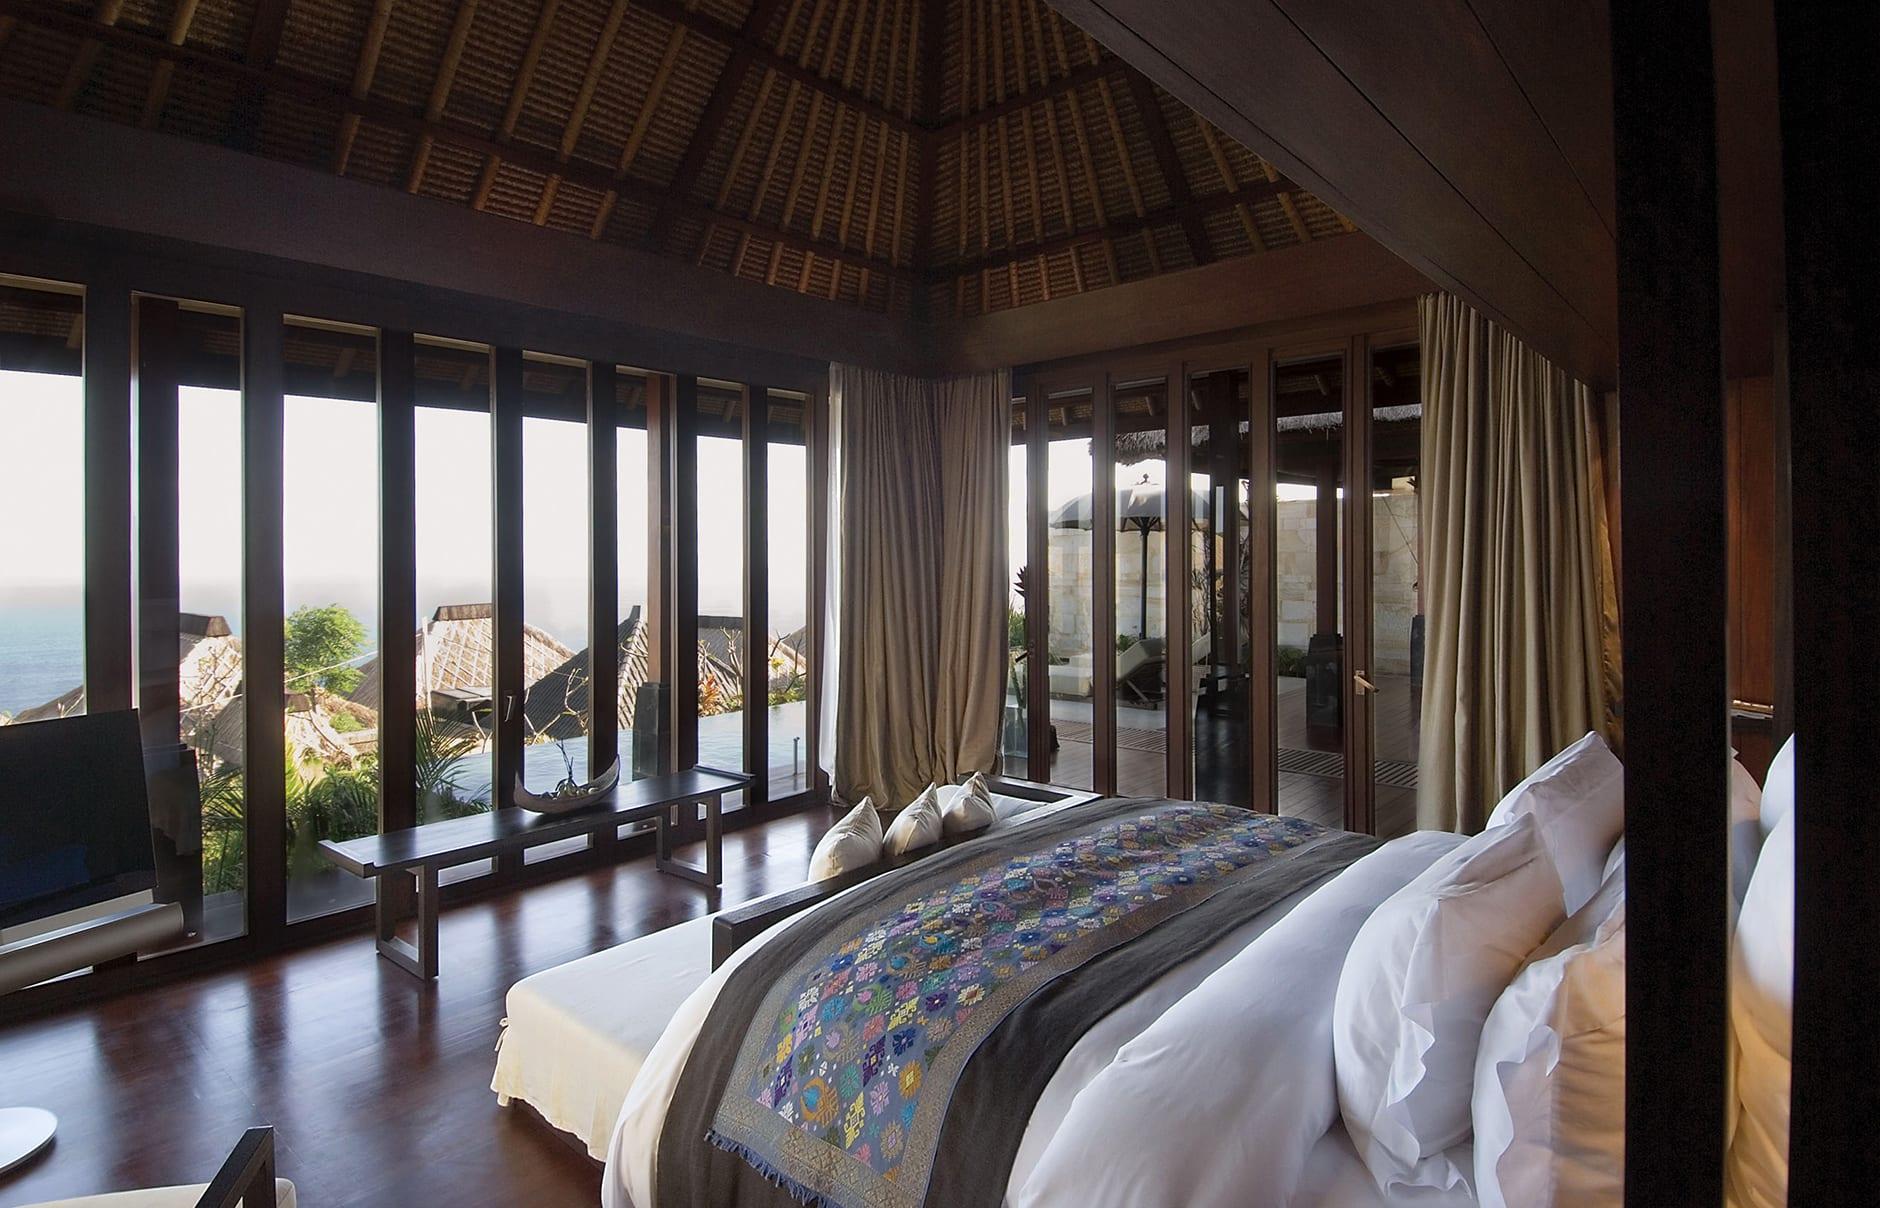 Bulgari Resort Bali Luxury Hotels TravelPlusStyle